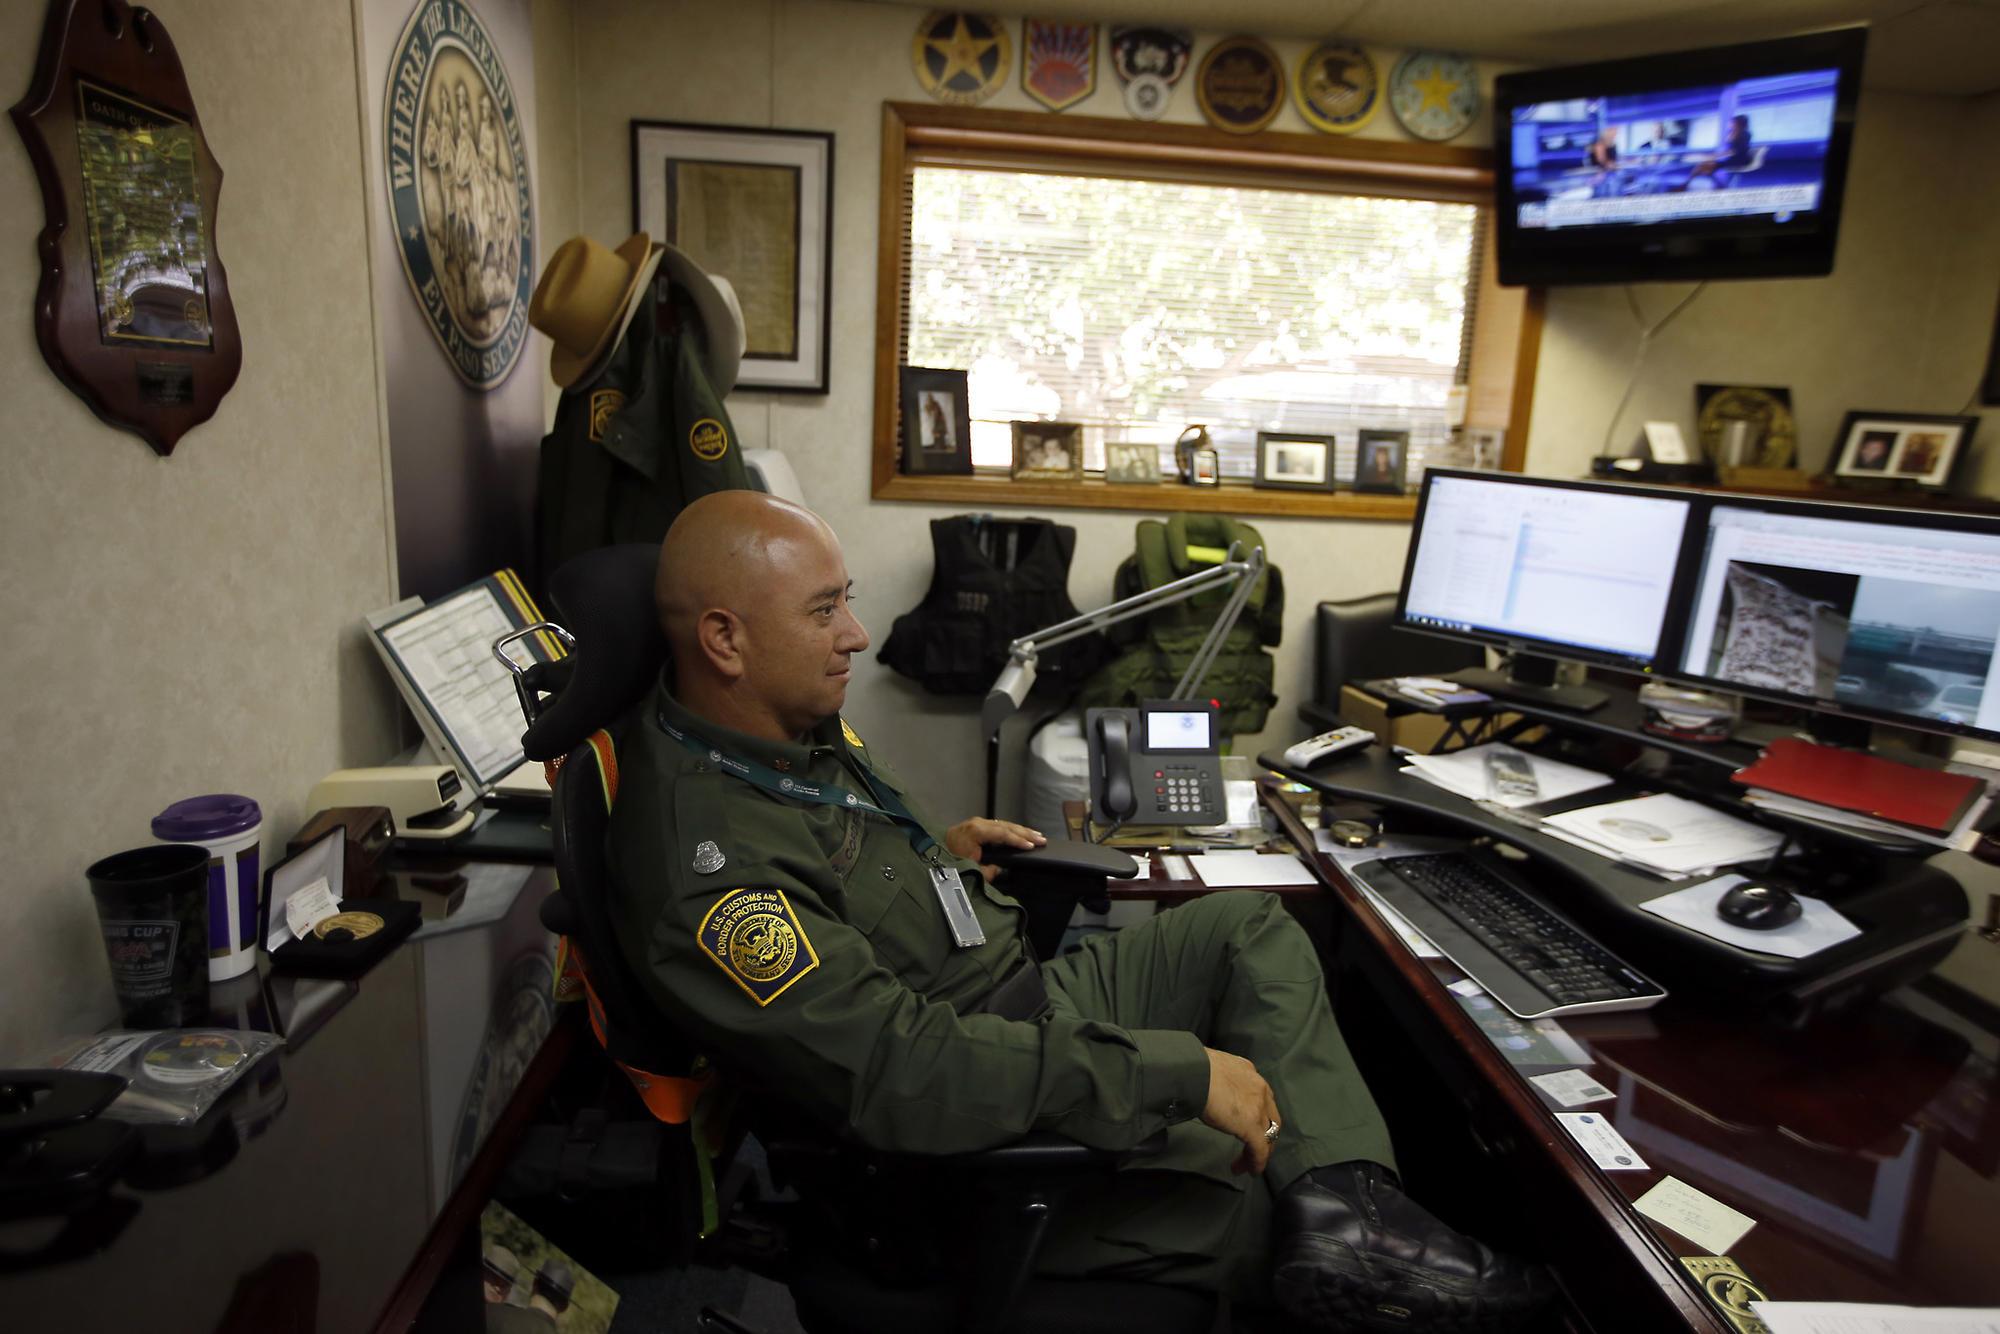 3023925_la-na-border-officer_14.FO.jpg